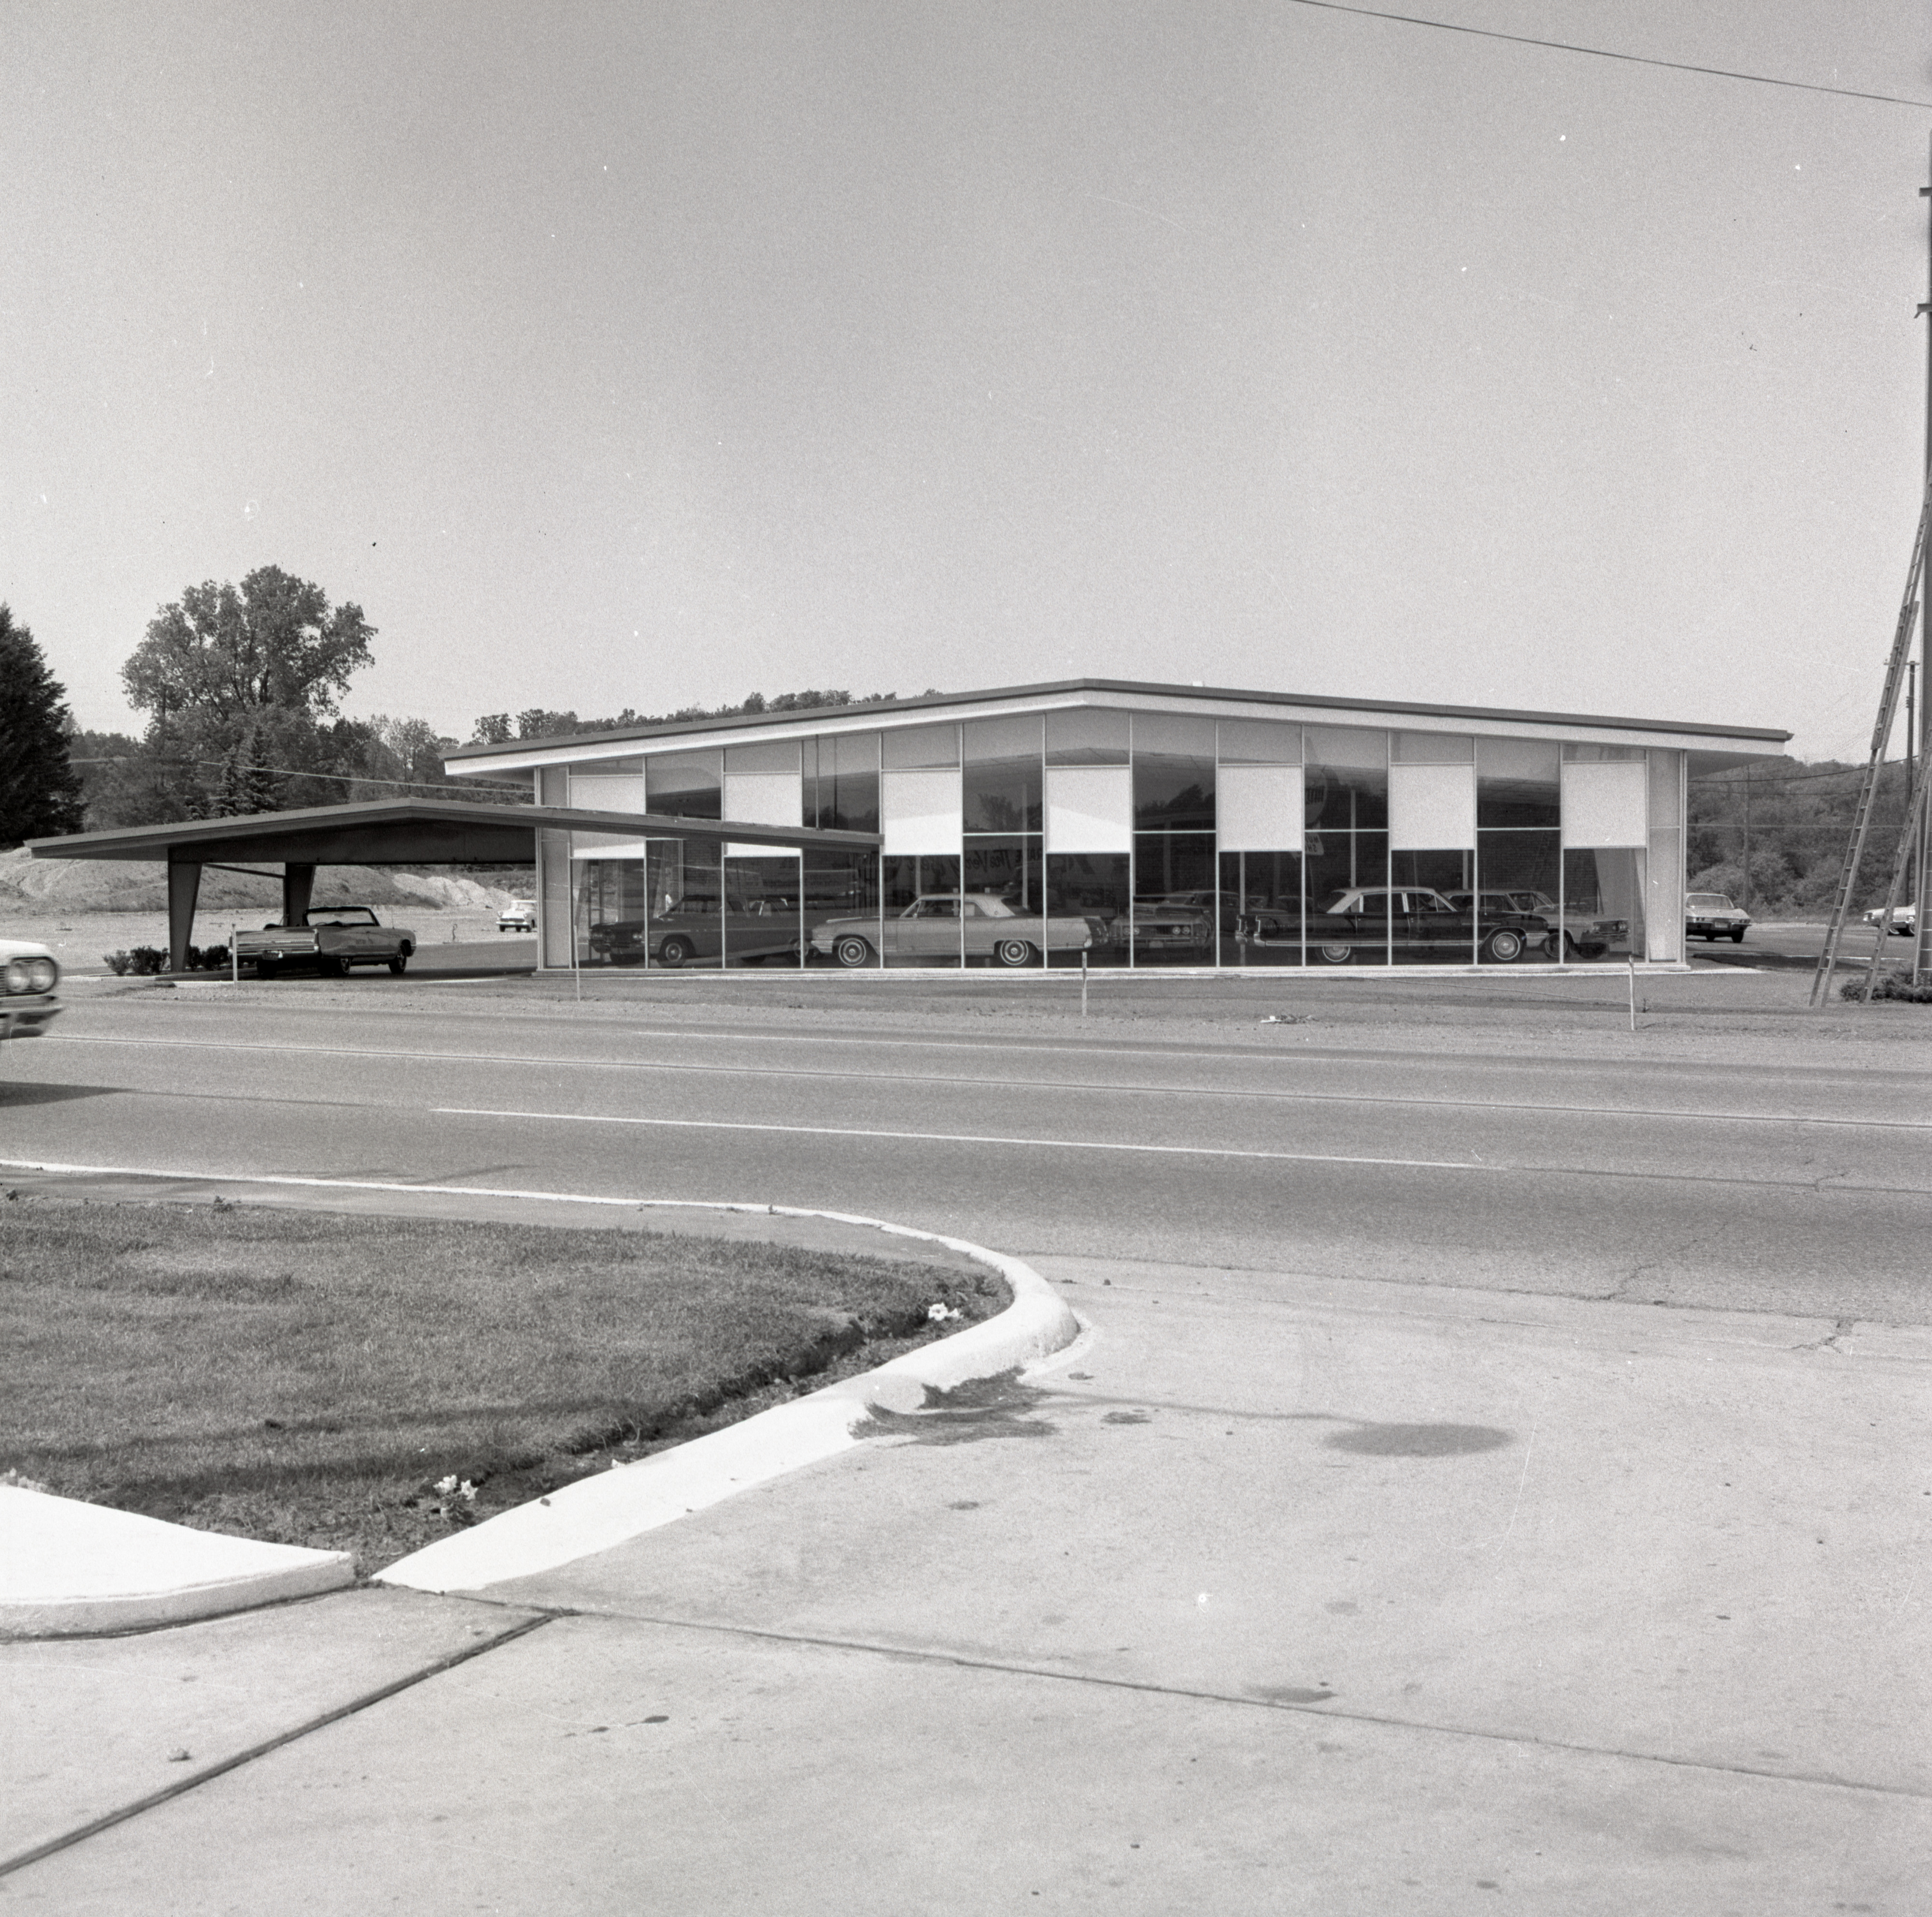 ann arbor buick - 3165 washtenaw, june 1964   ann arbor district library